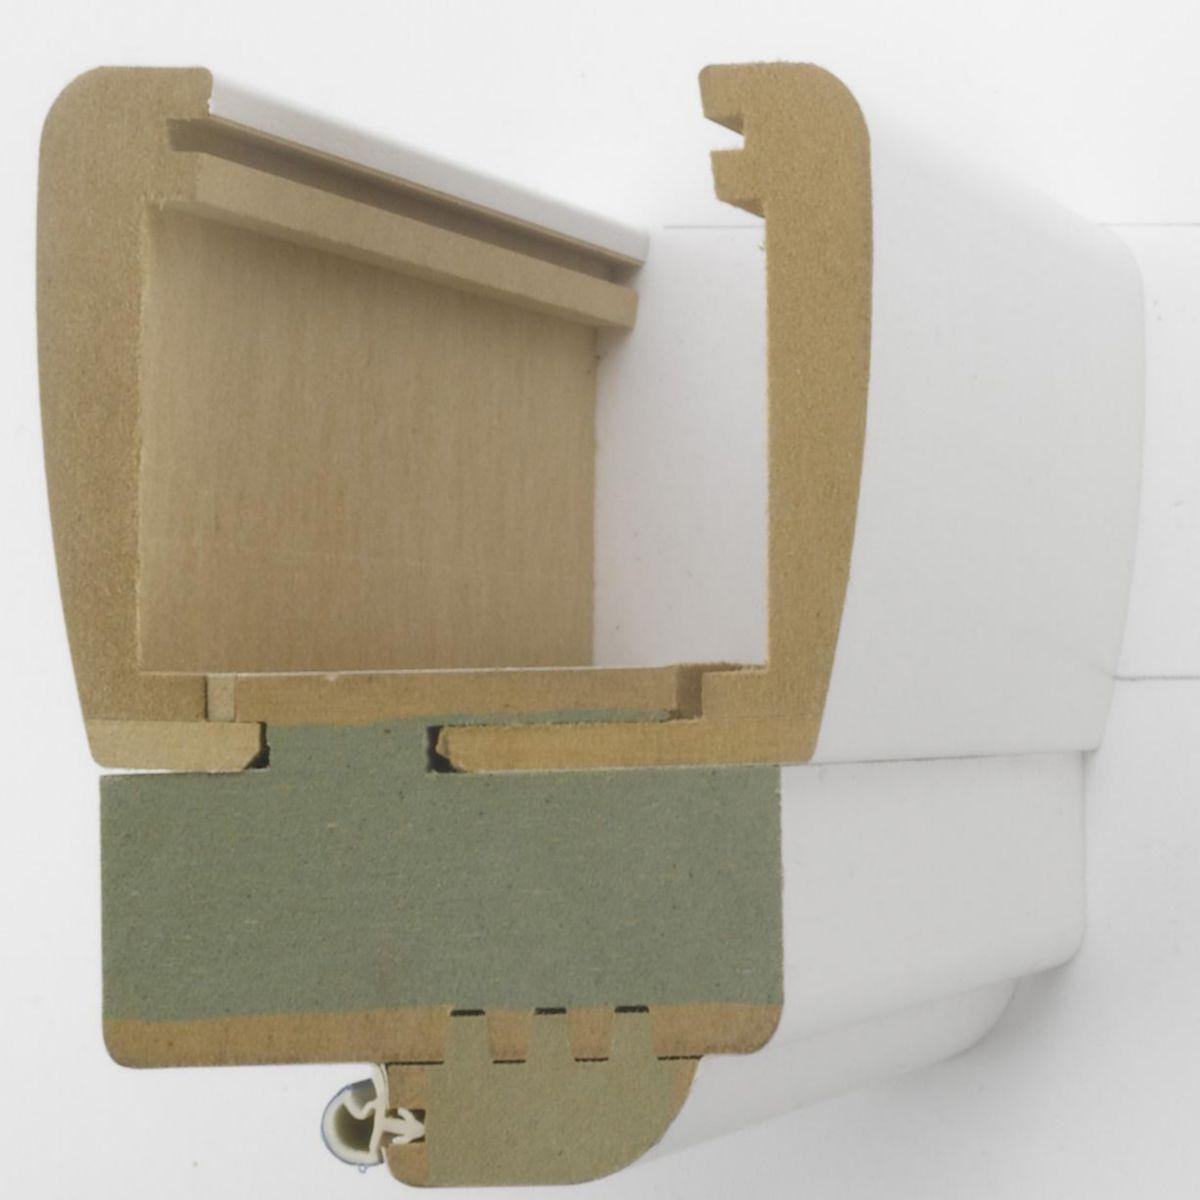 righini chambranle contre chambranle pour cloison 93 120. Black Bedroom Furniture Sets. Home Design Ideas